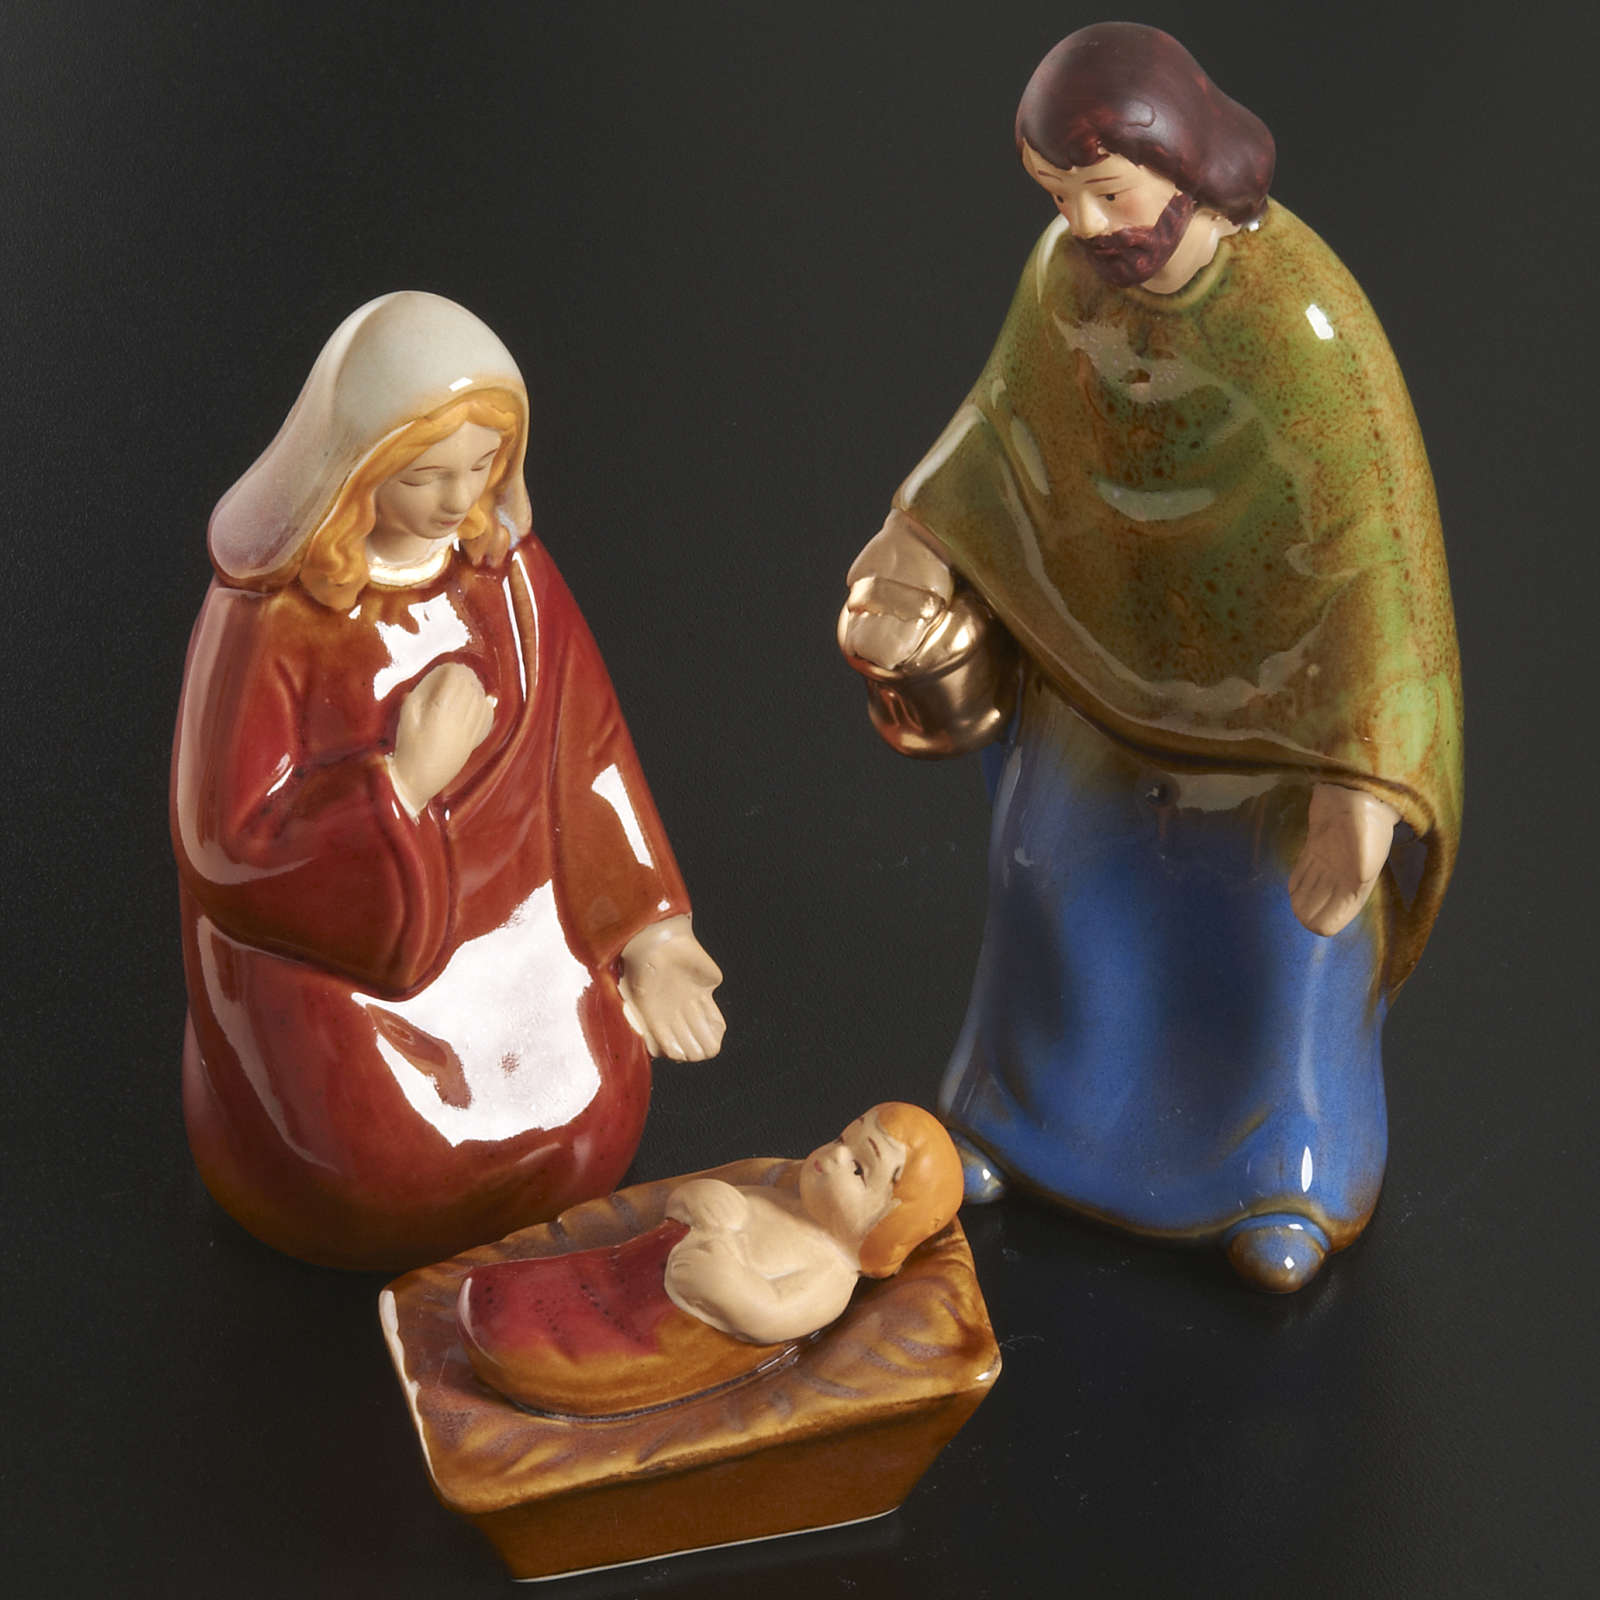 Nativity scene full set in ceramic, 11 figurines, 15 cm 4